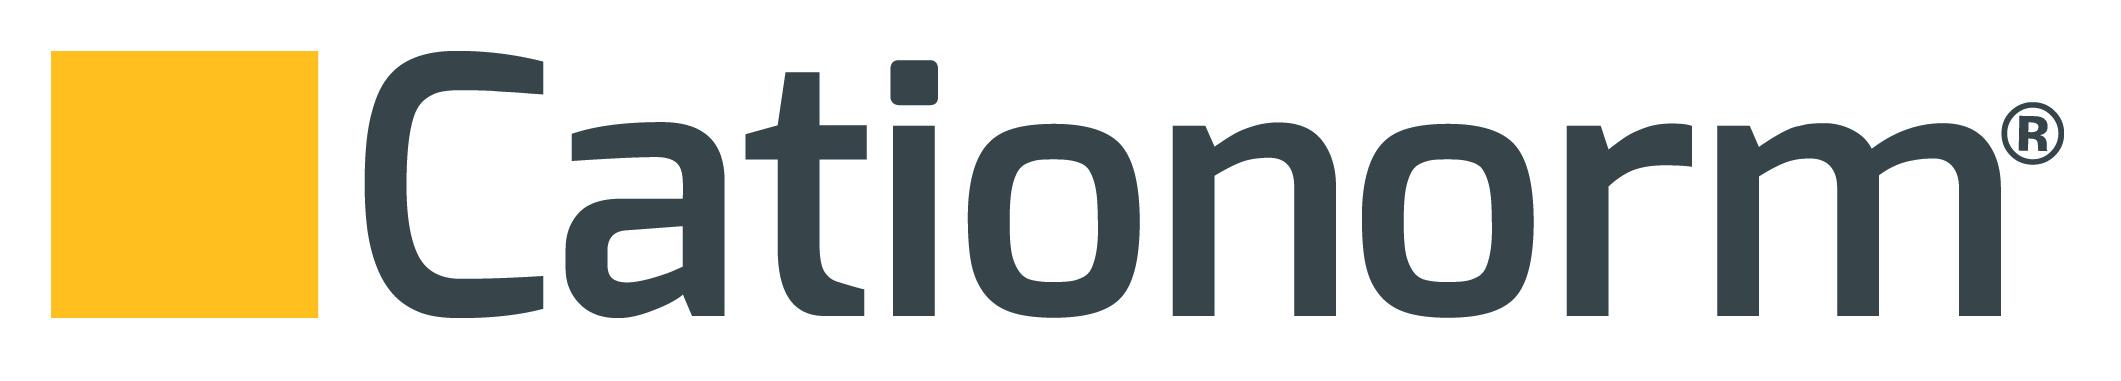 Cationorm Logo CMYK